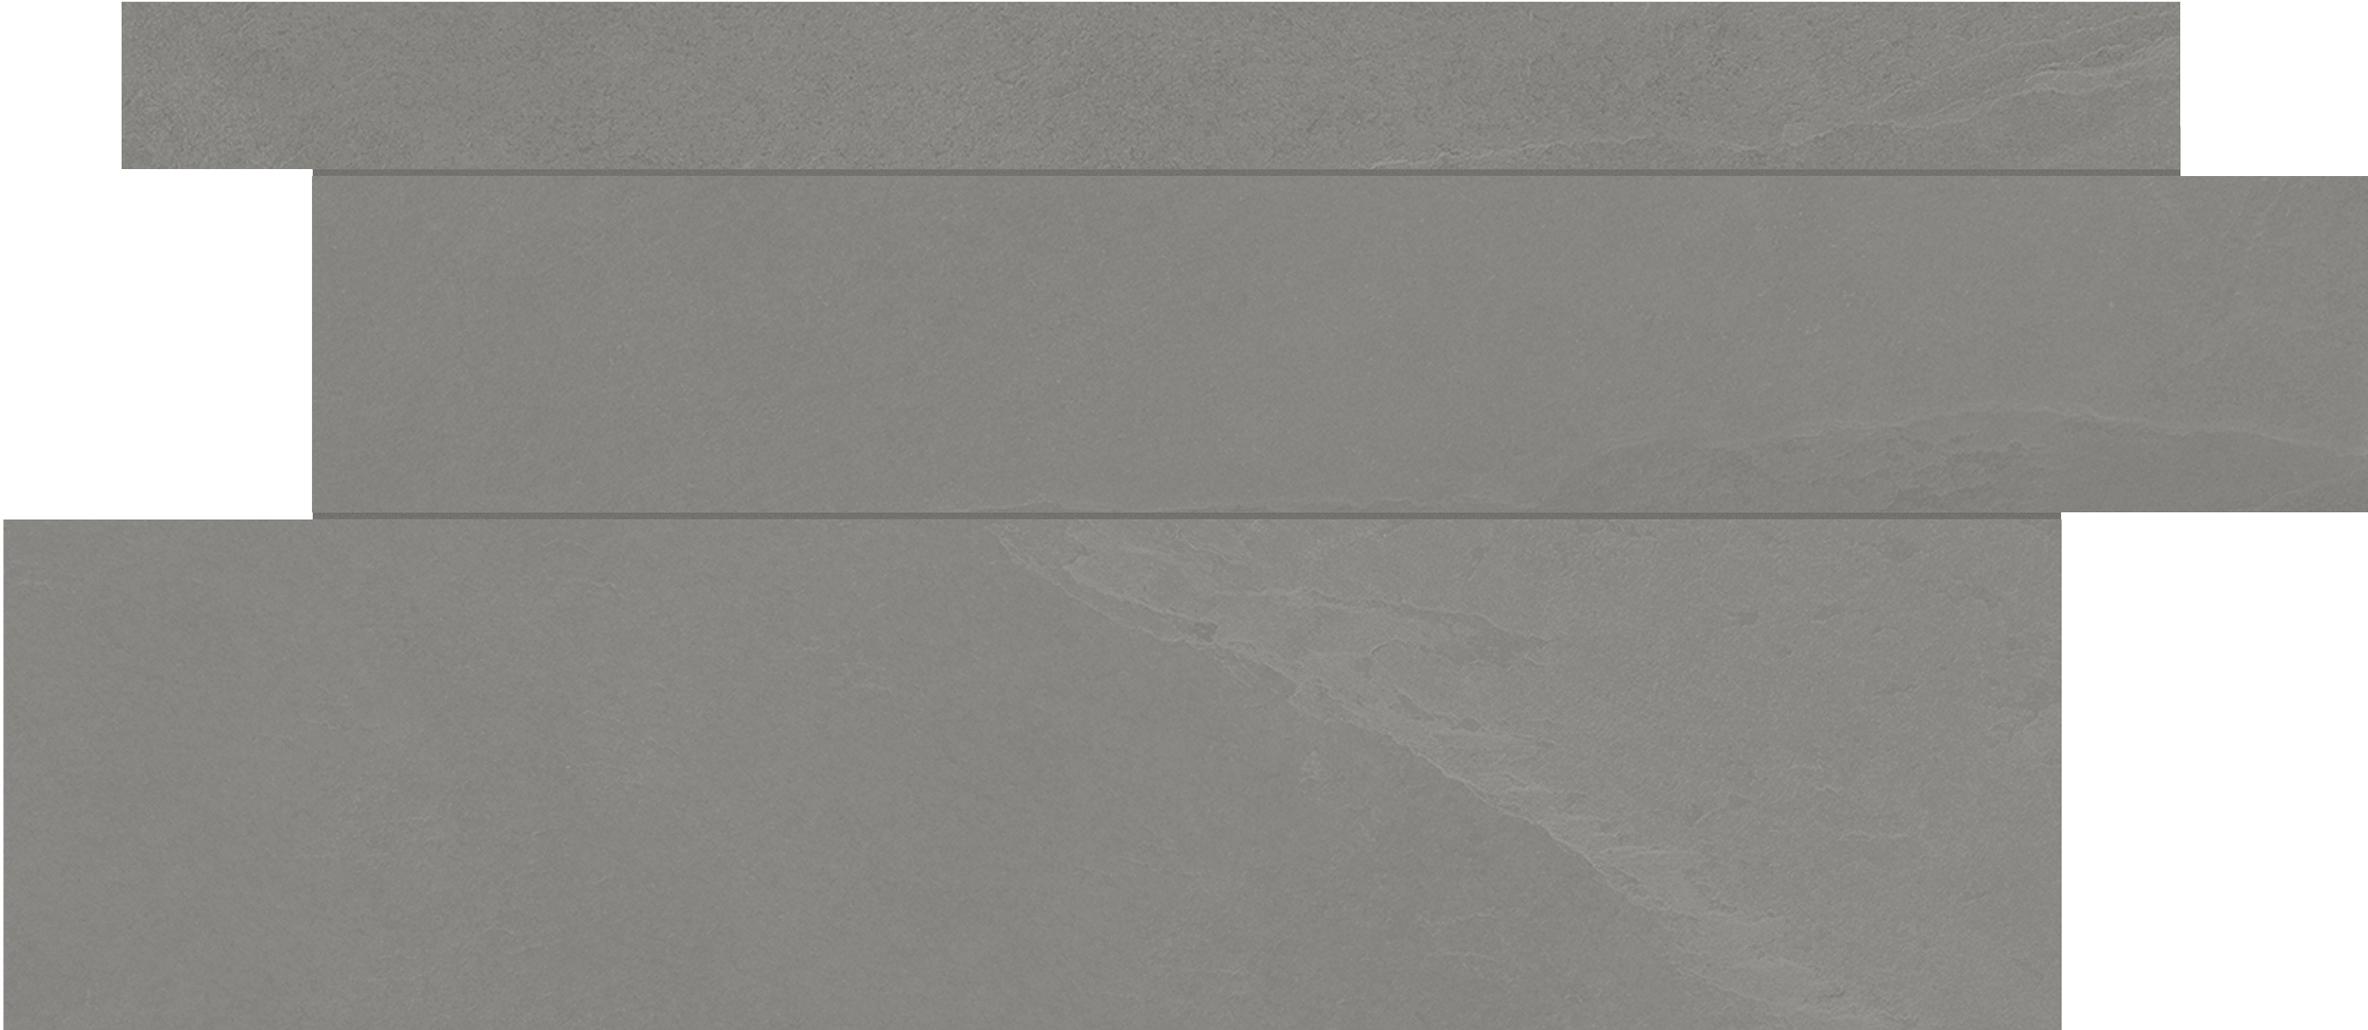 Unicom Starker BRAZILIAN SLATE SILK WHITE PLANK UNI-0008487 Bodenfliese 30x60 Matt